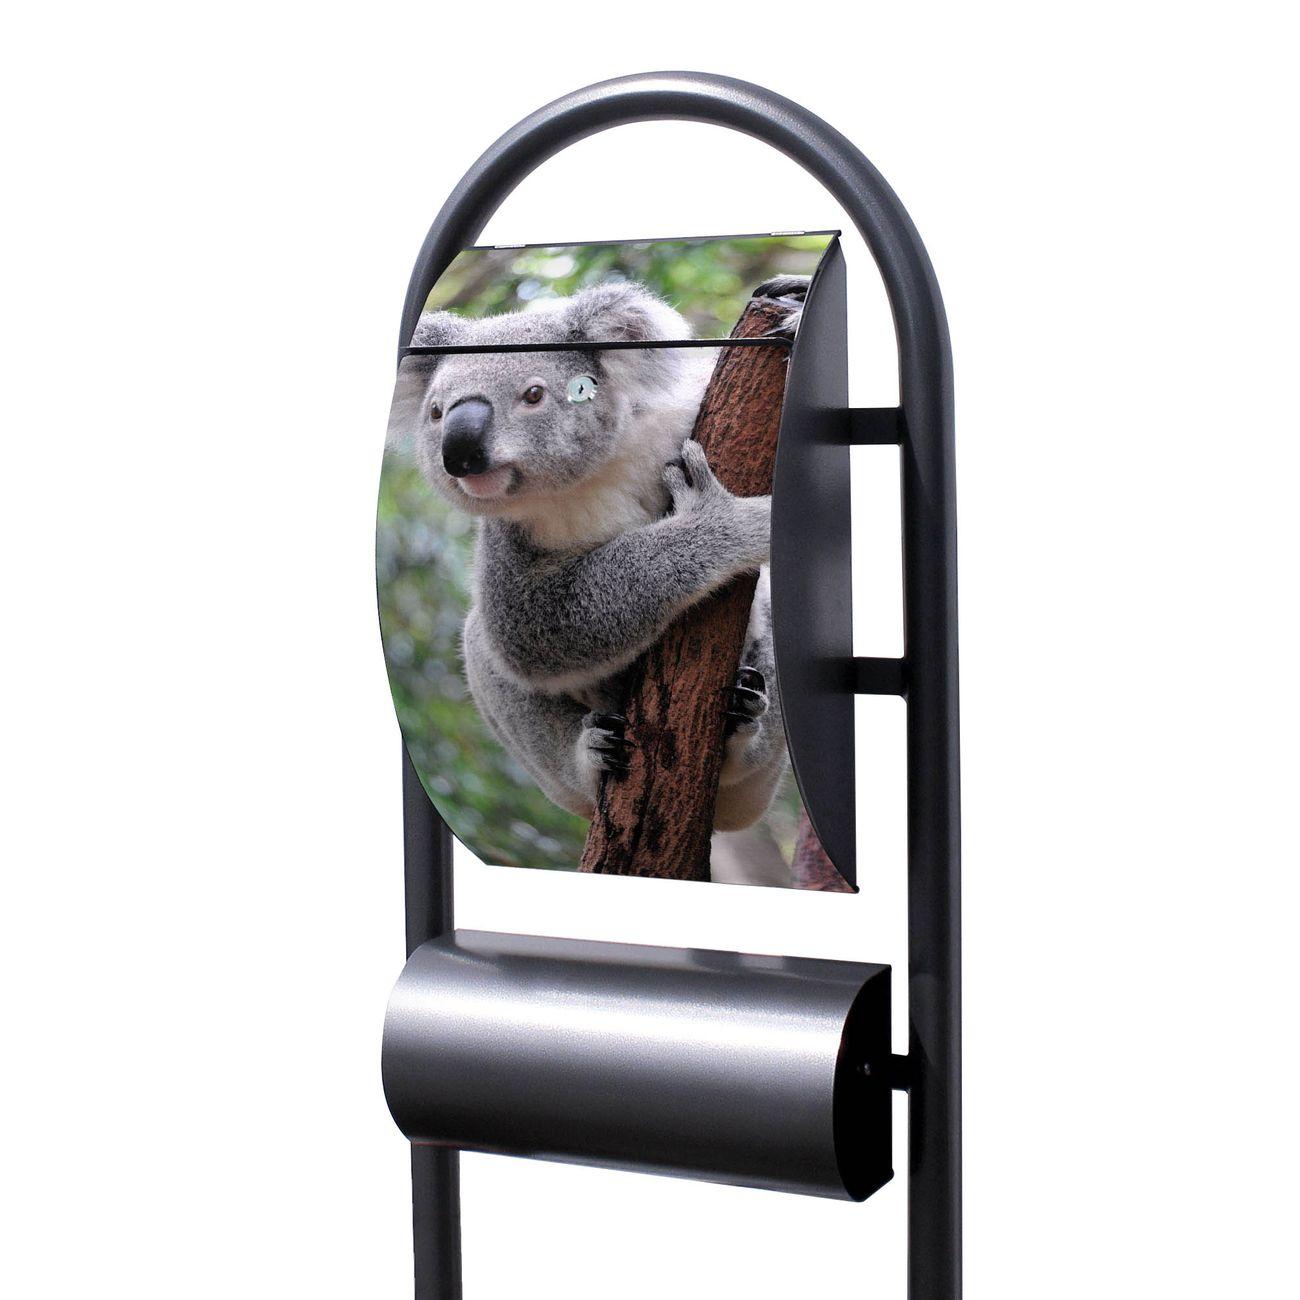 Standbriefkasten Hammerschlag Koala